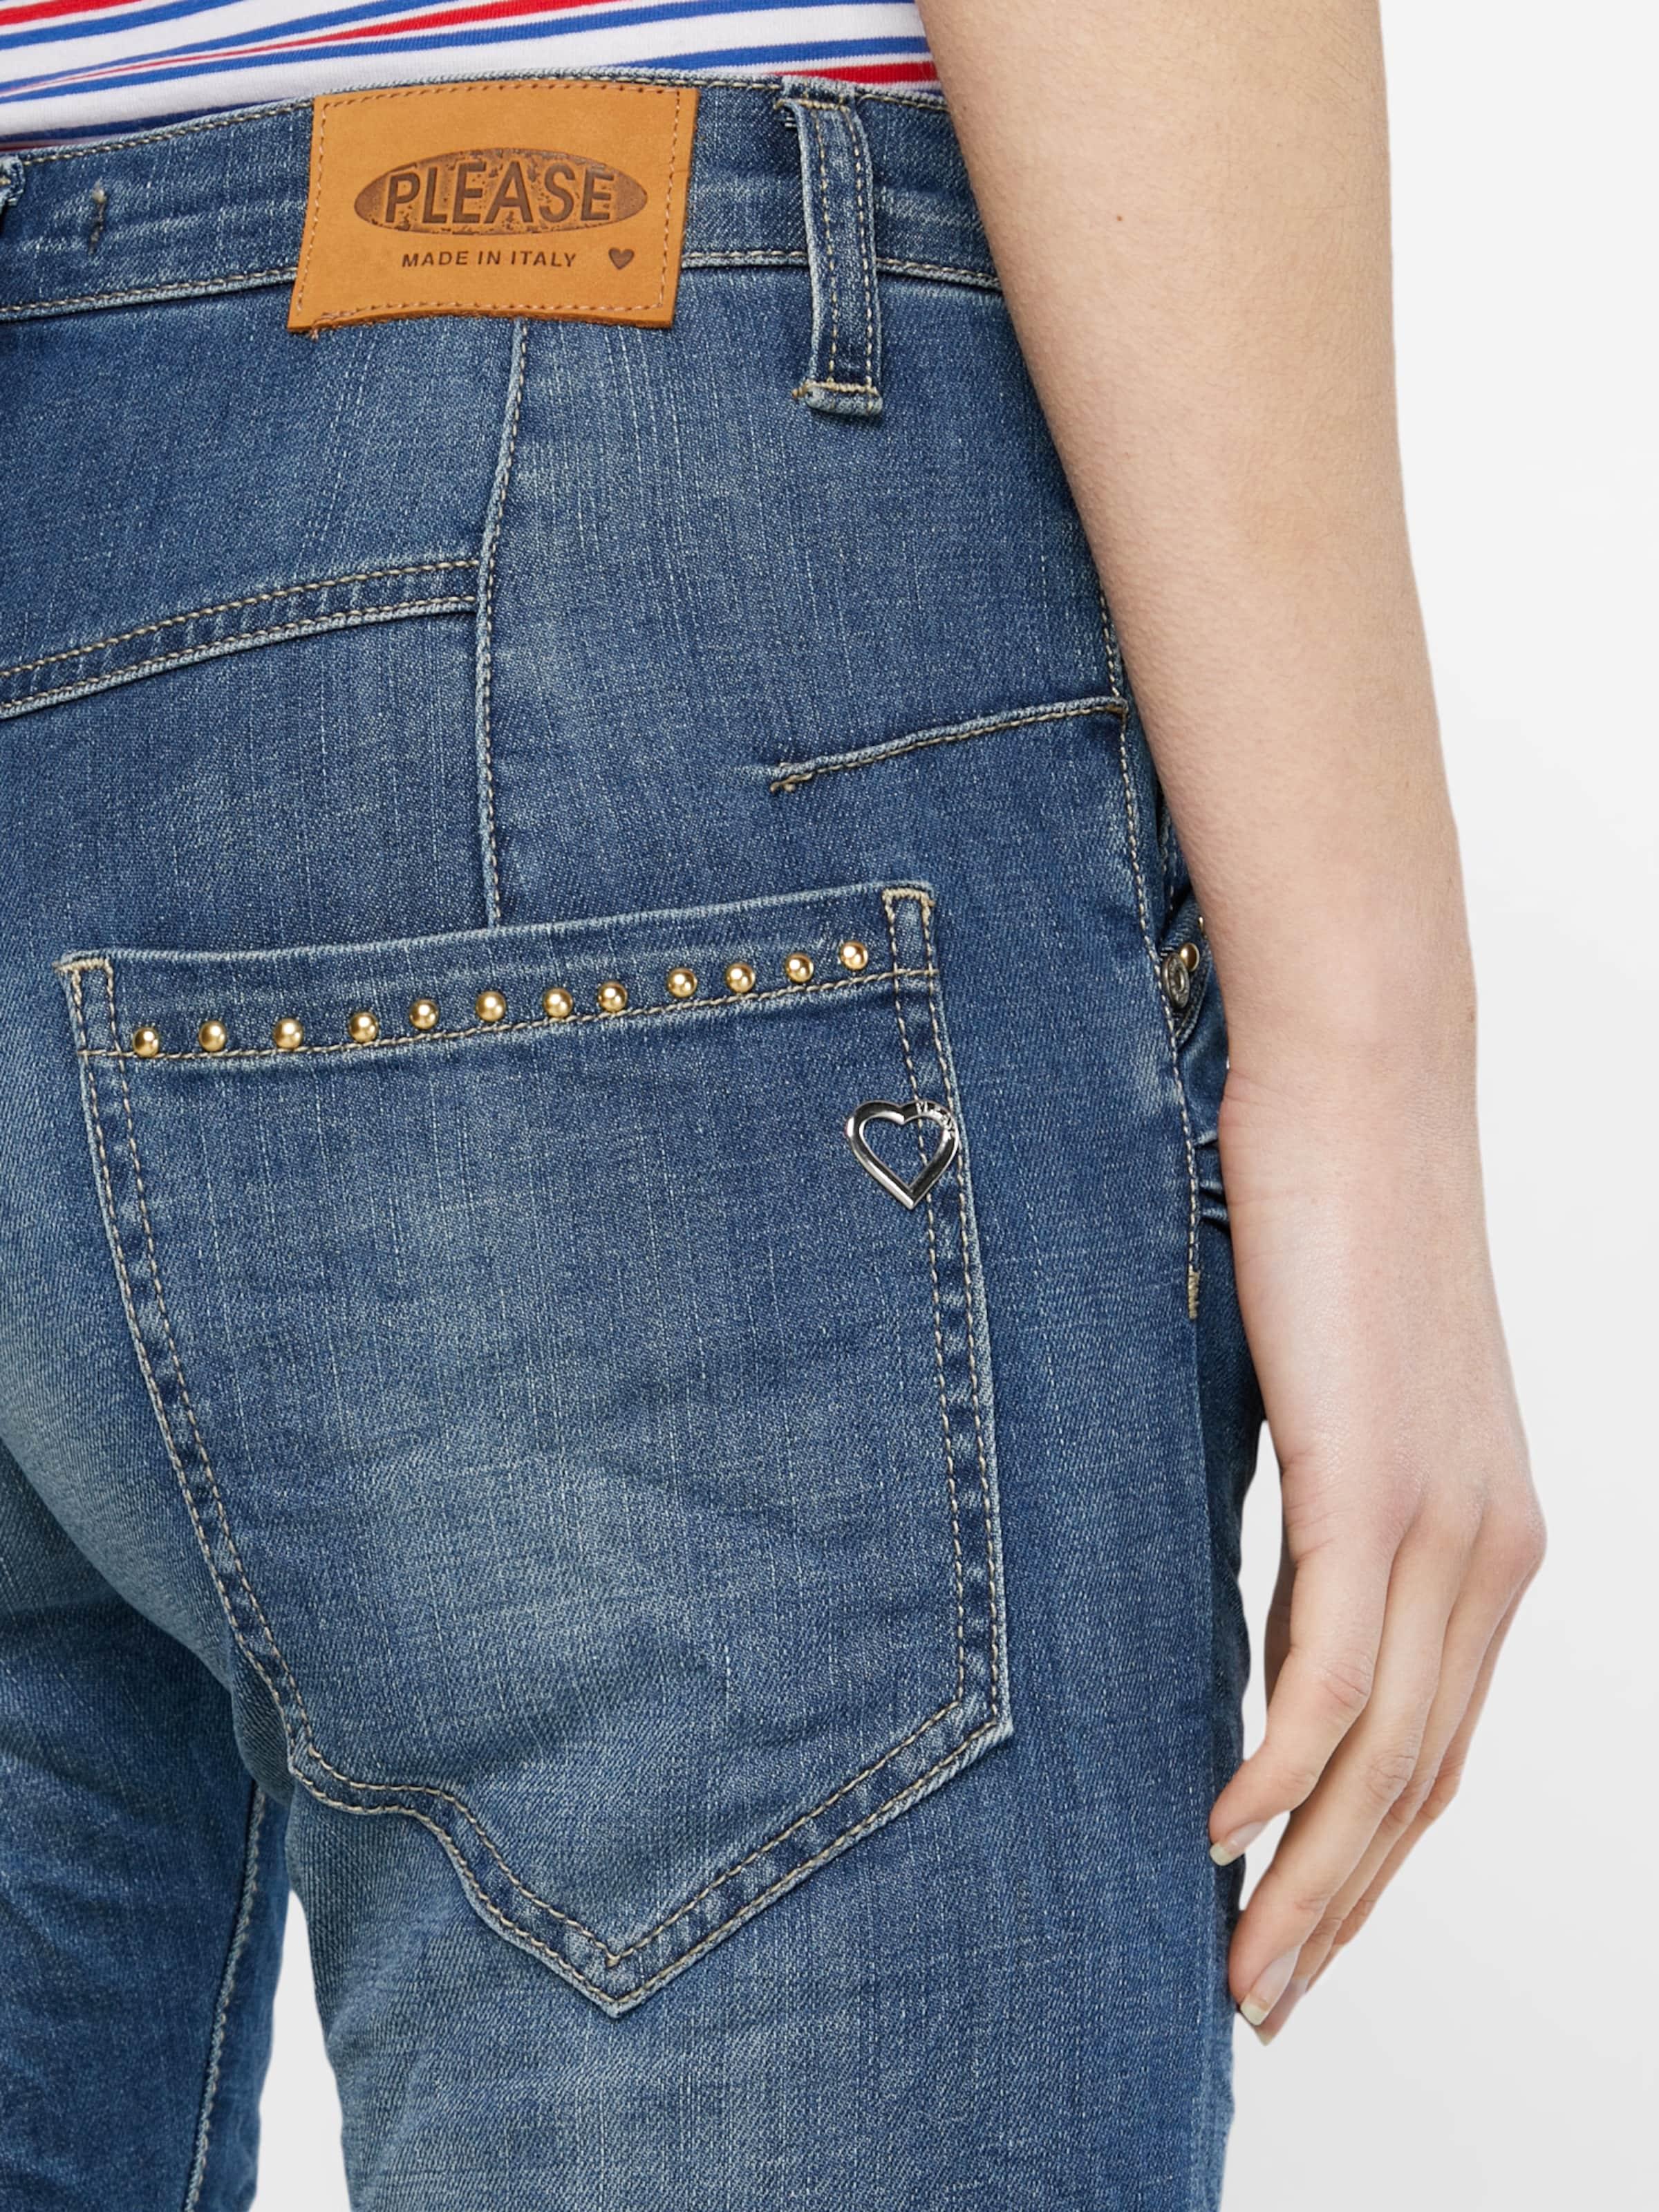 PLEASE Loosefit Jeans mit Crinkle-Effekt Billige Angebote Vorbestellung Outlet Top-Qualität Billig Verkauf Finden Große Günstiger Preis Großhandelspreis NGYw59Qu